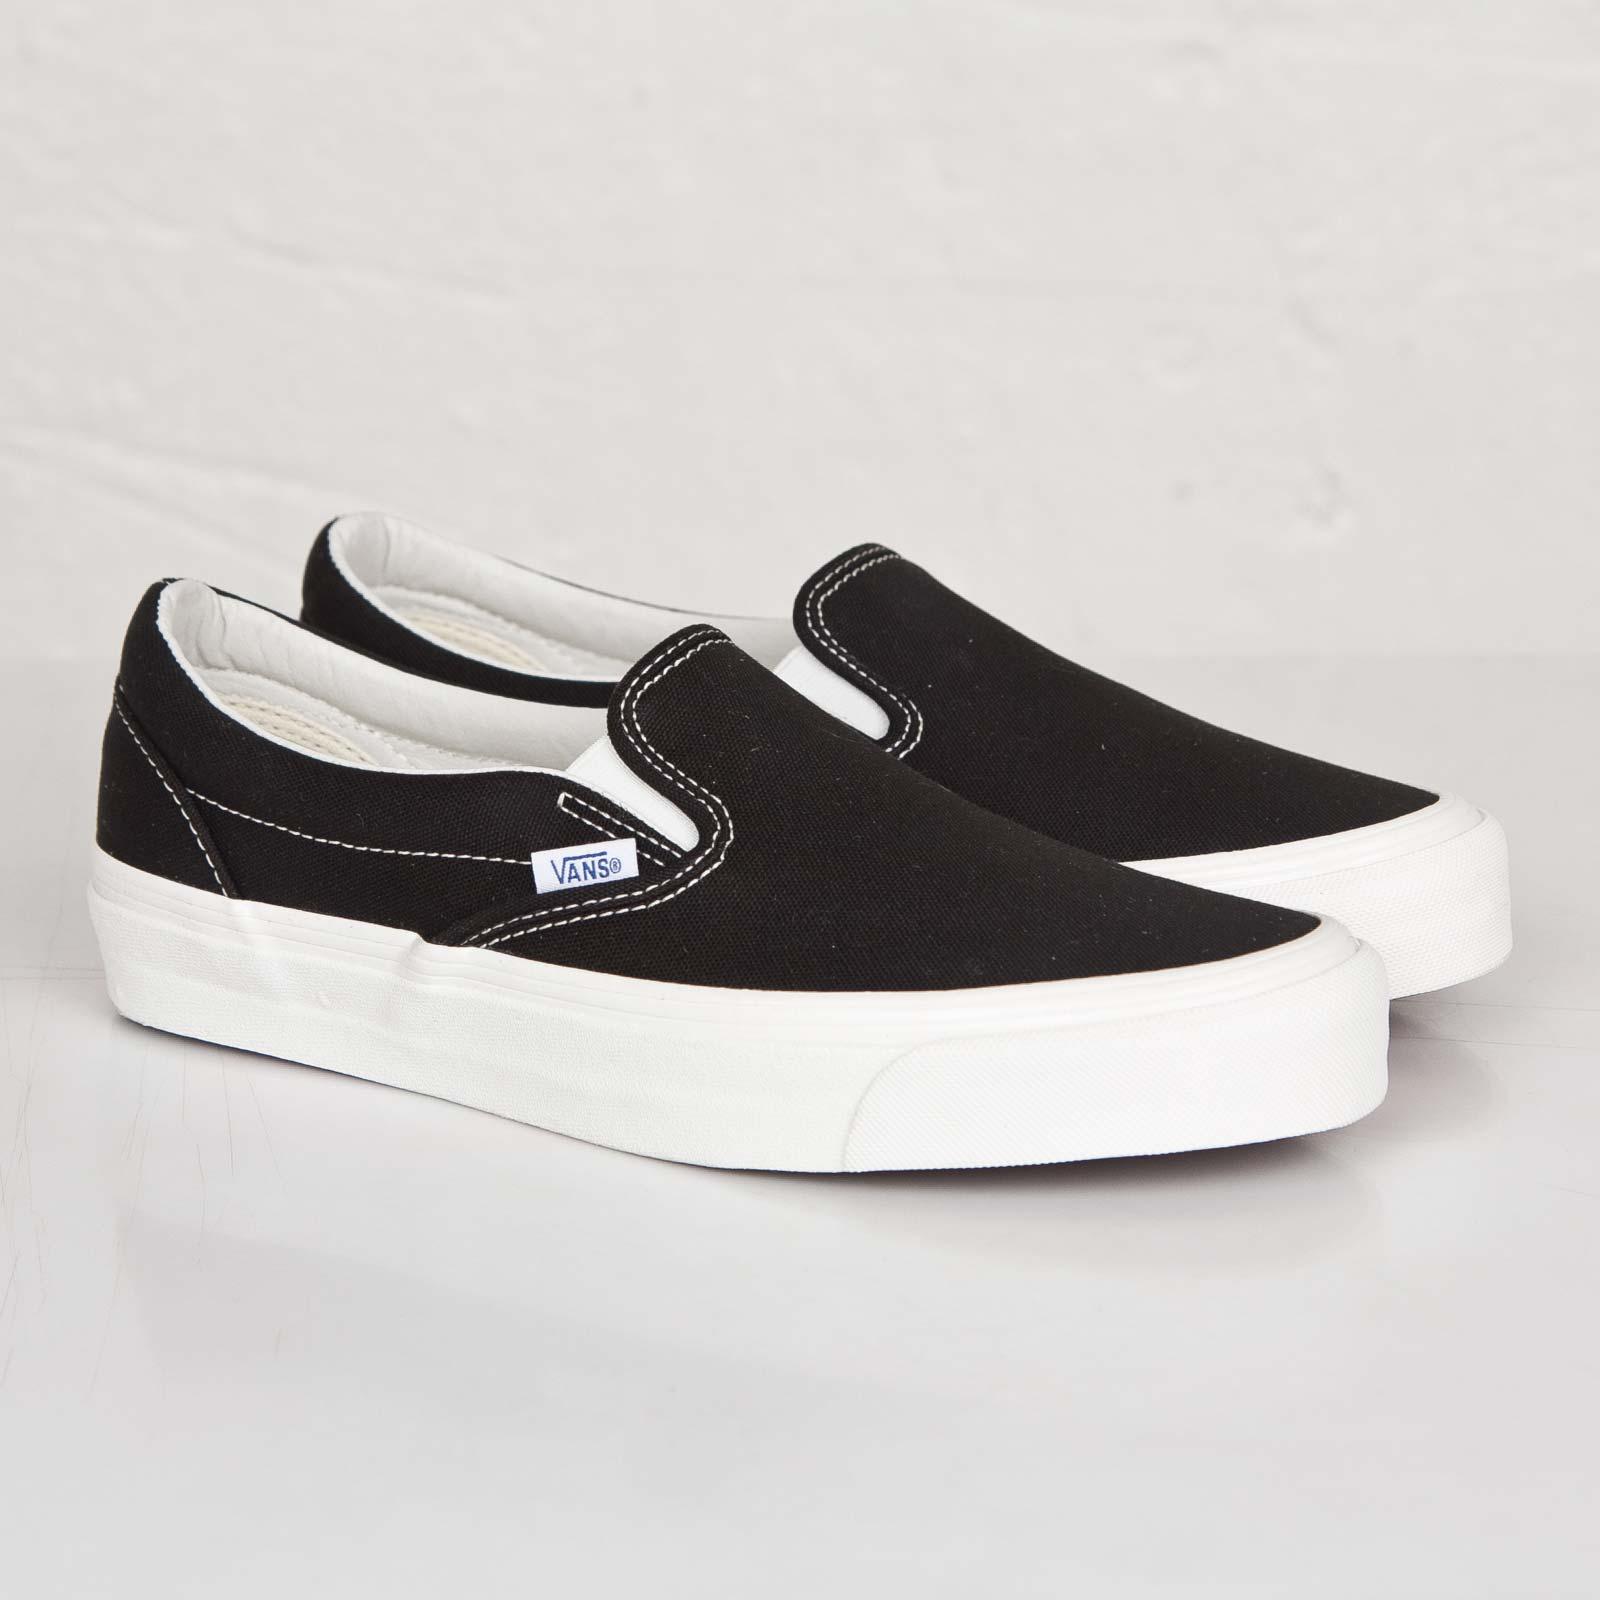 448334f946 Vans OG Classic Slip-On - Udf3sy - Sneakersnstuff